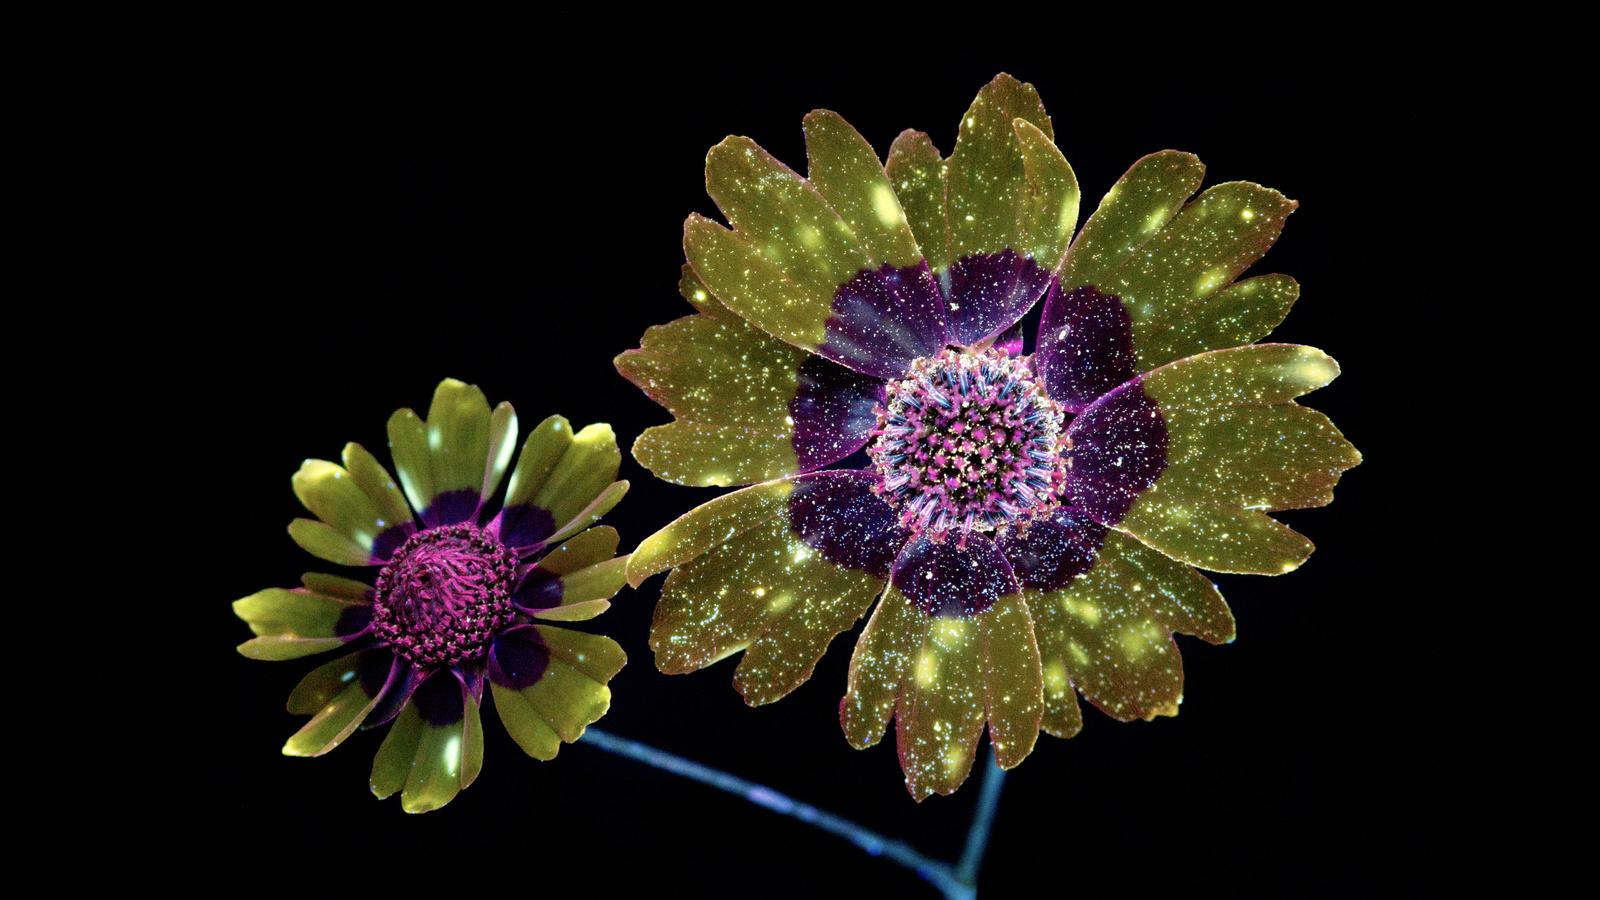 macos, mojave, flowers